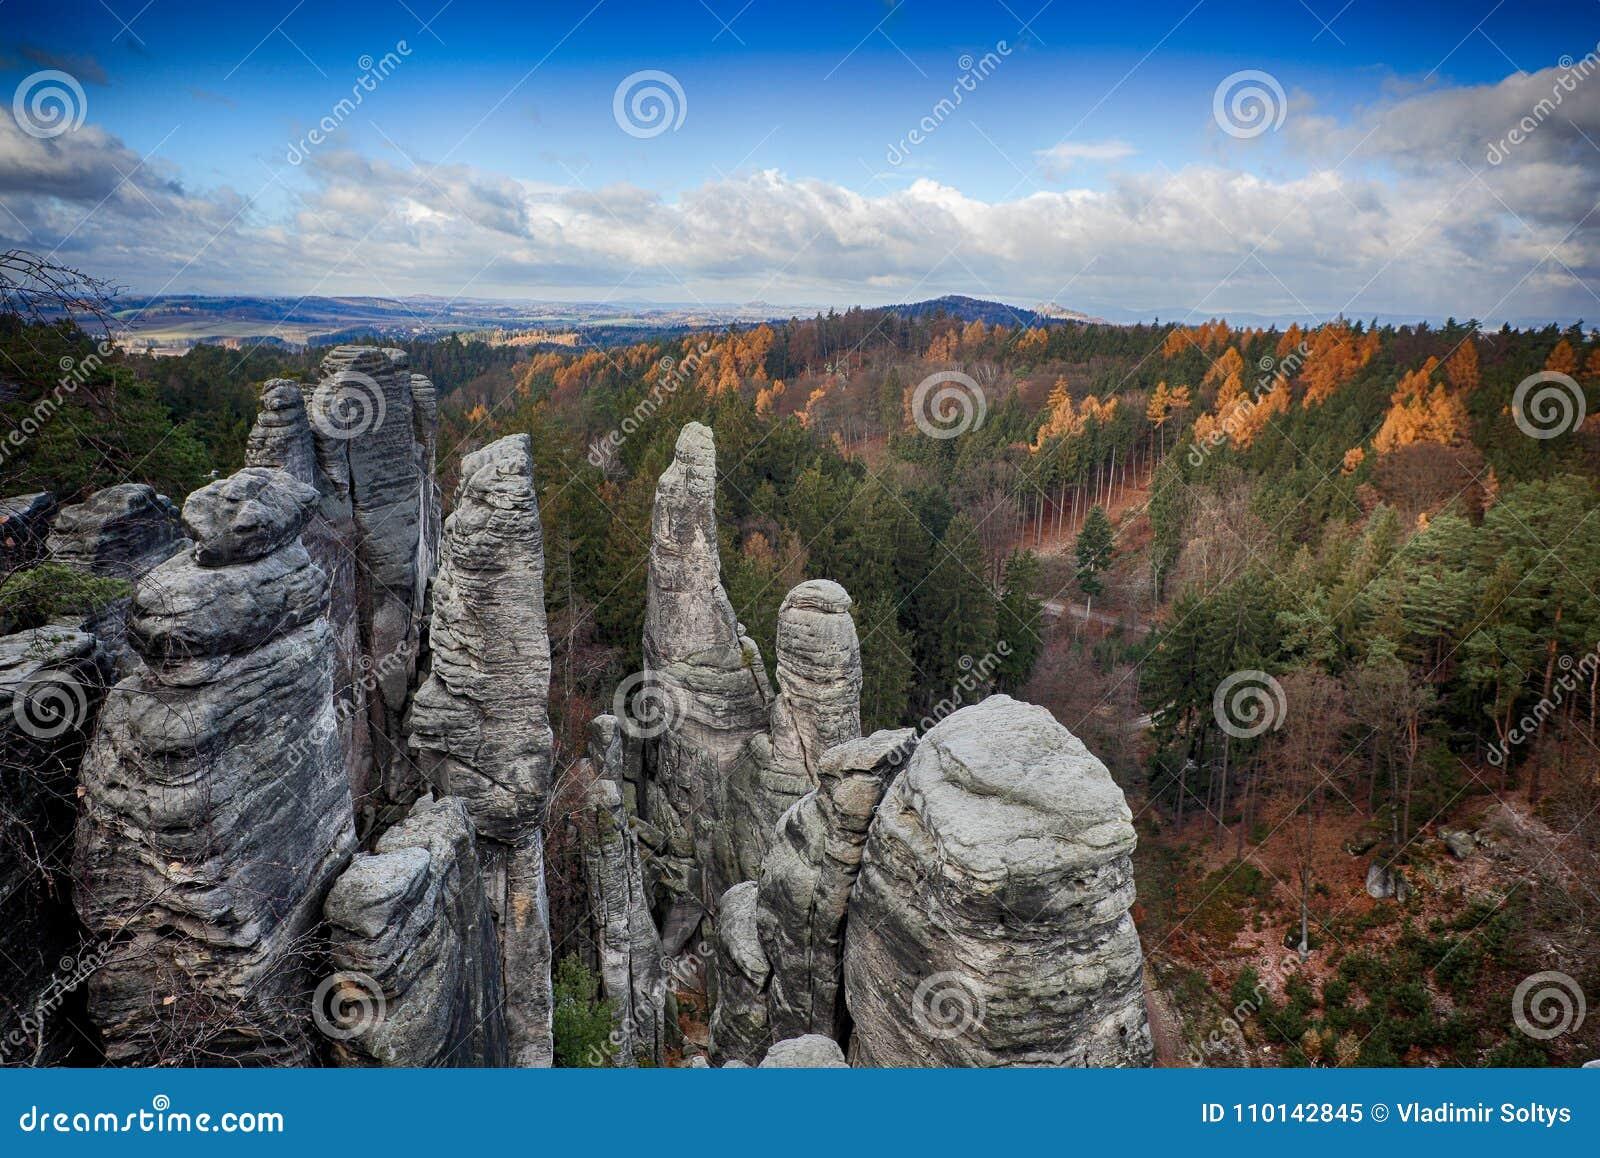 Prachov rocks in Bohemian paradise